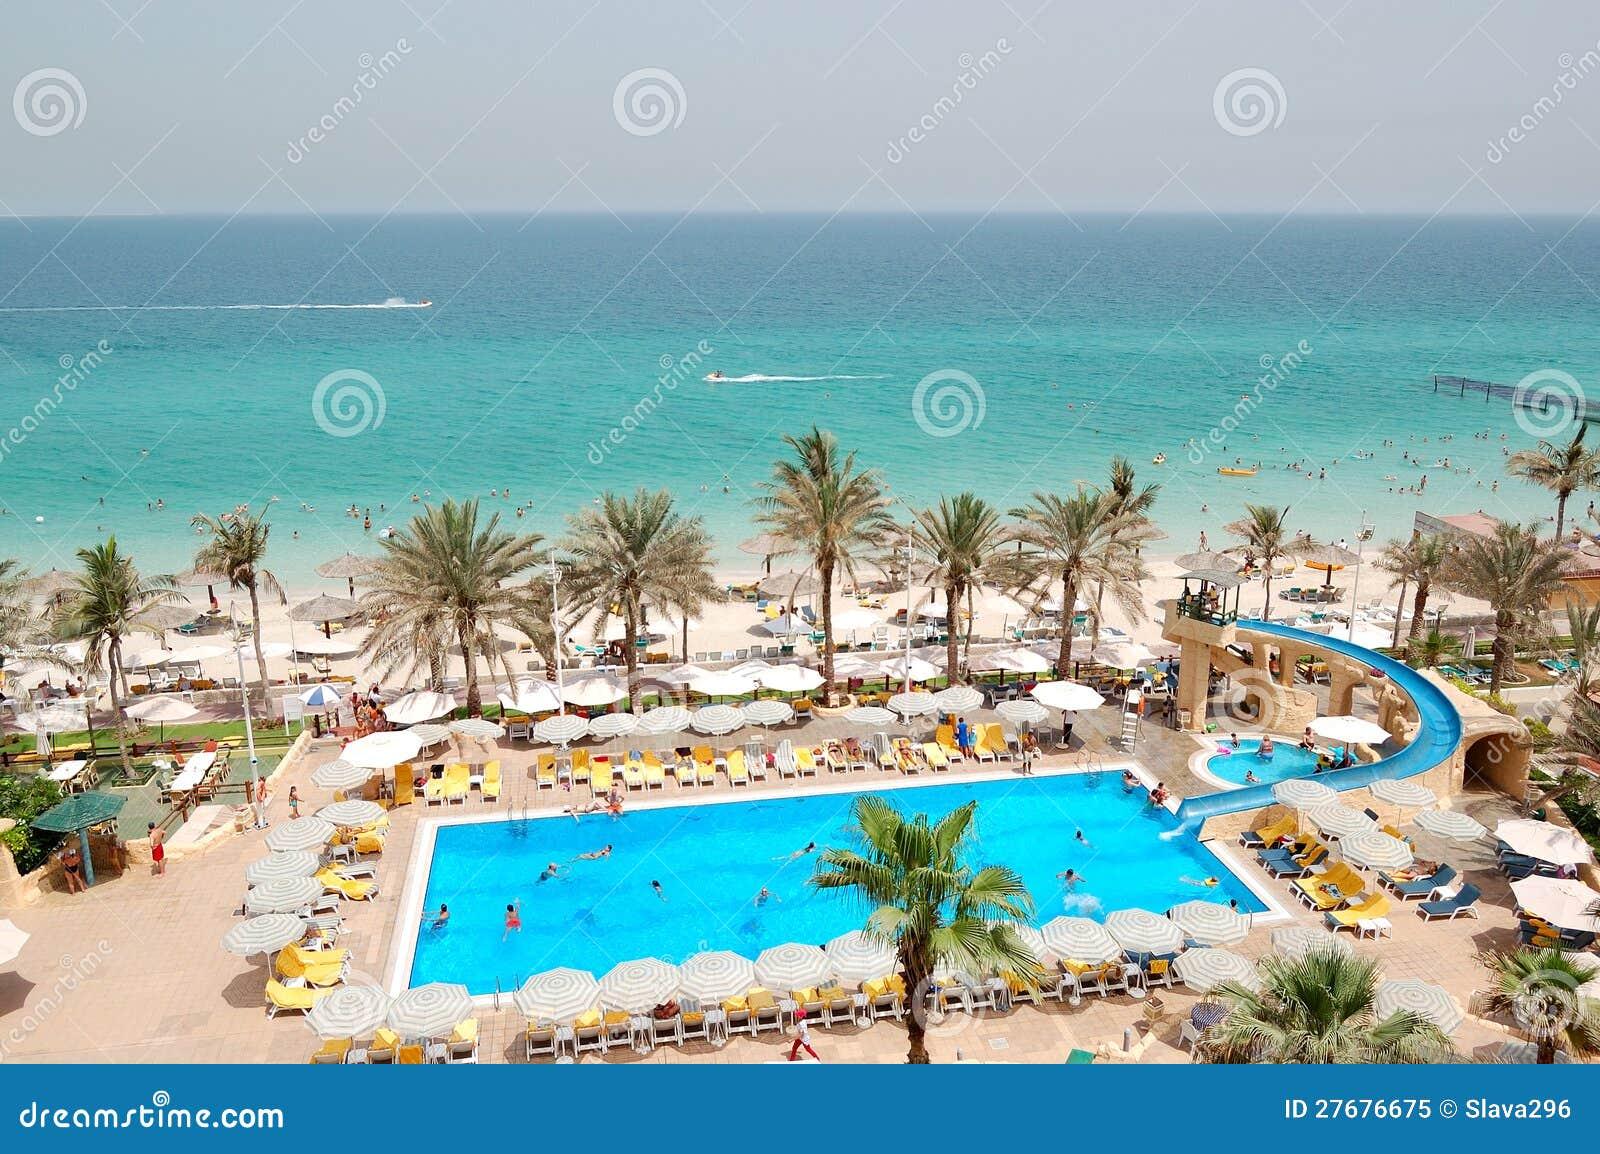 Piscina perto da praia no hotel de luxo foto de stock royalty free imagem 27676675 - Business plan piscina ...